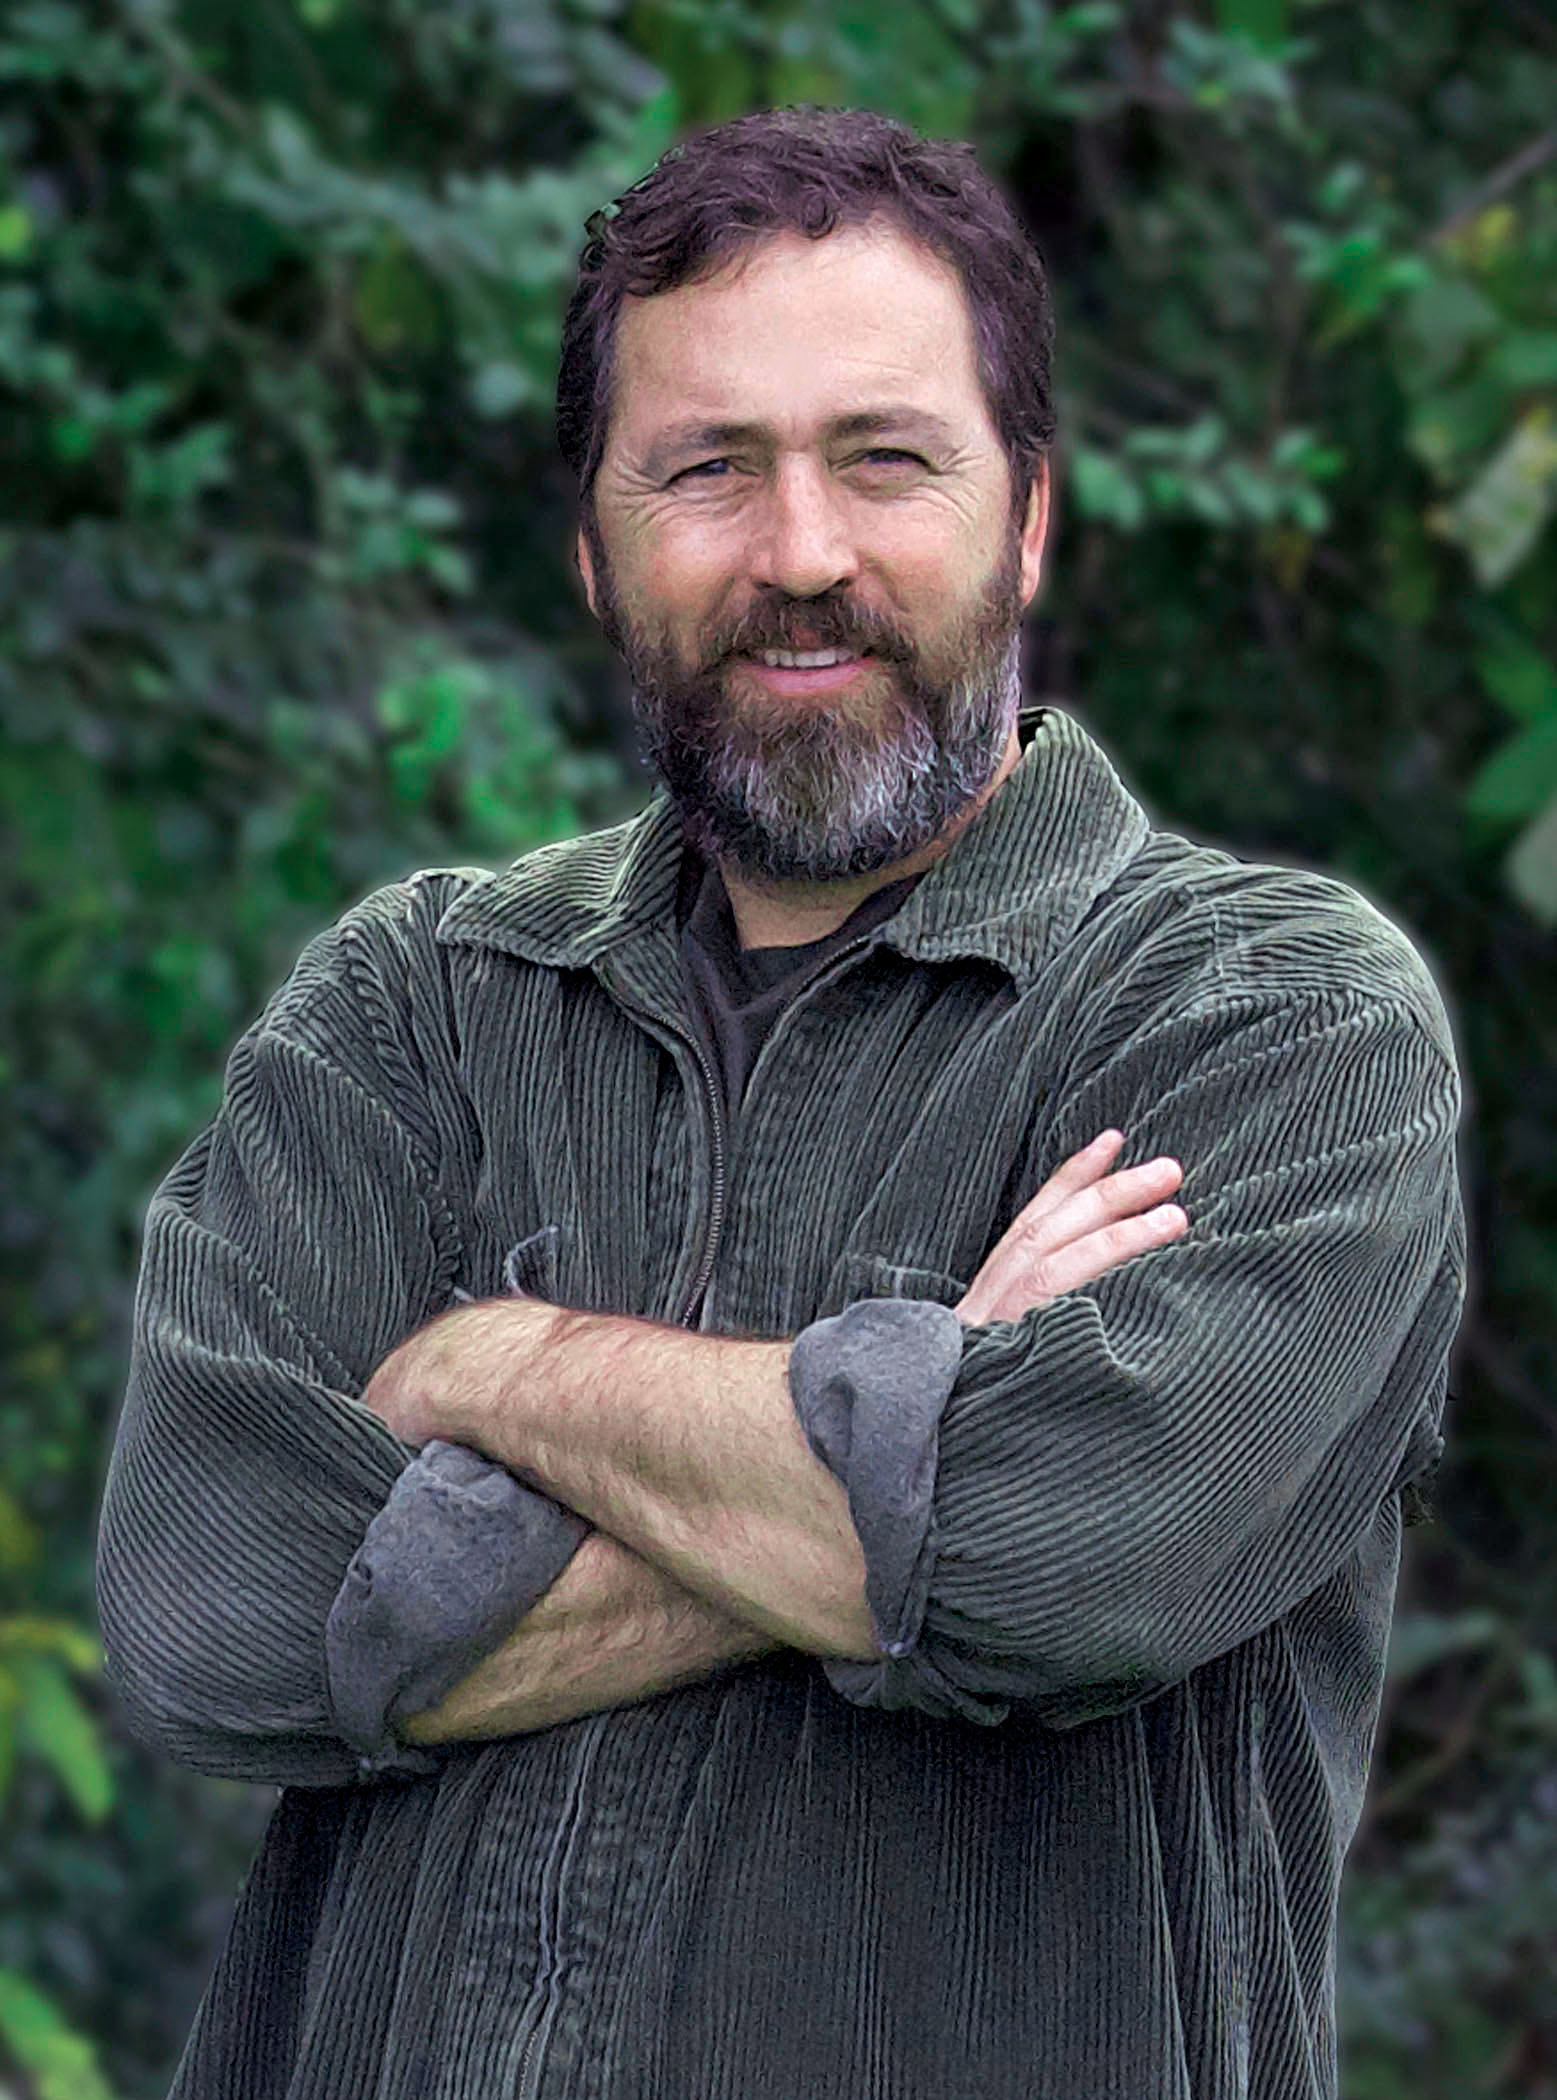 Author Photo (jpg): Alan Robertson